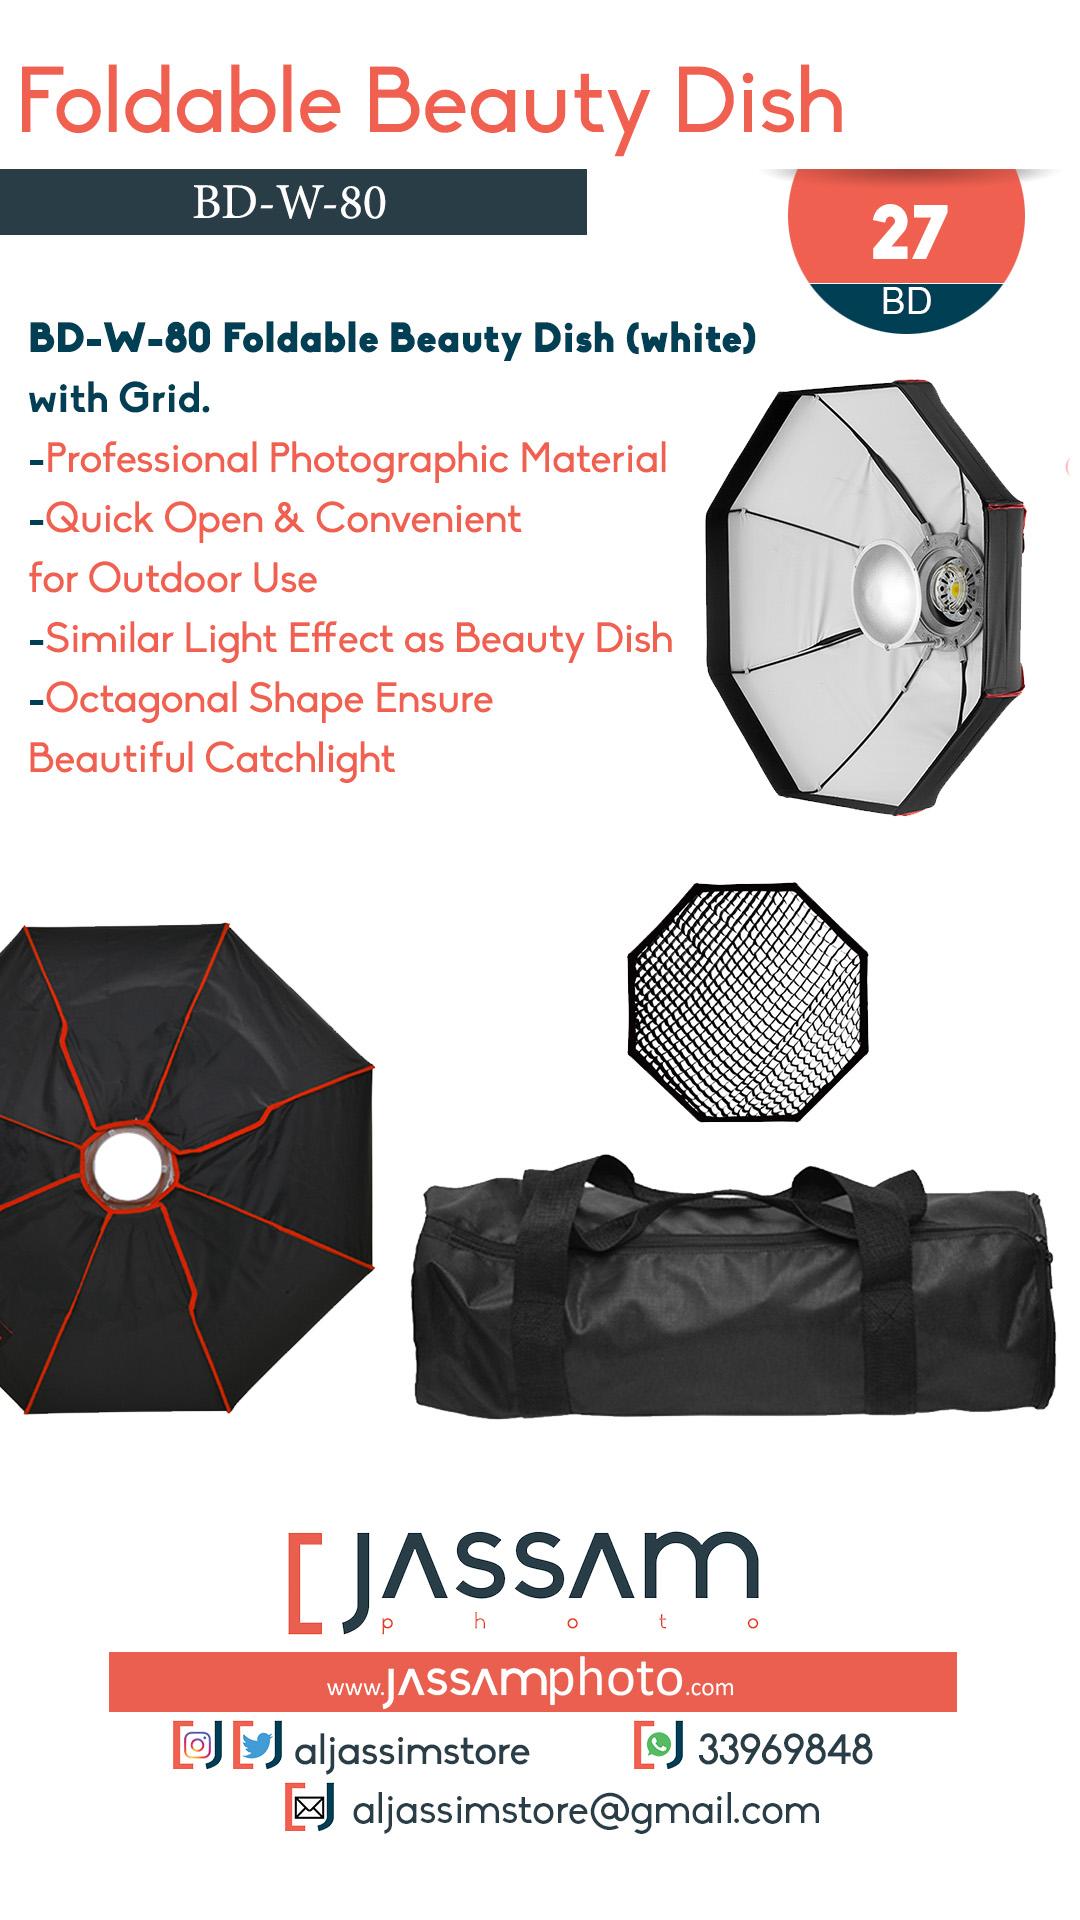 Foldable Beauty Dish BD-W-80